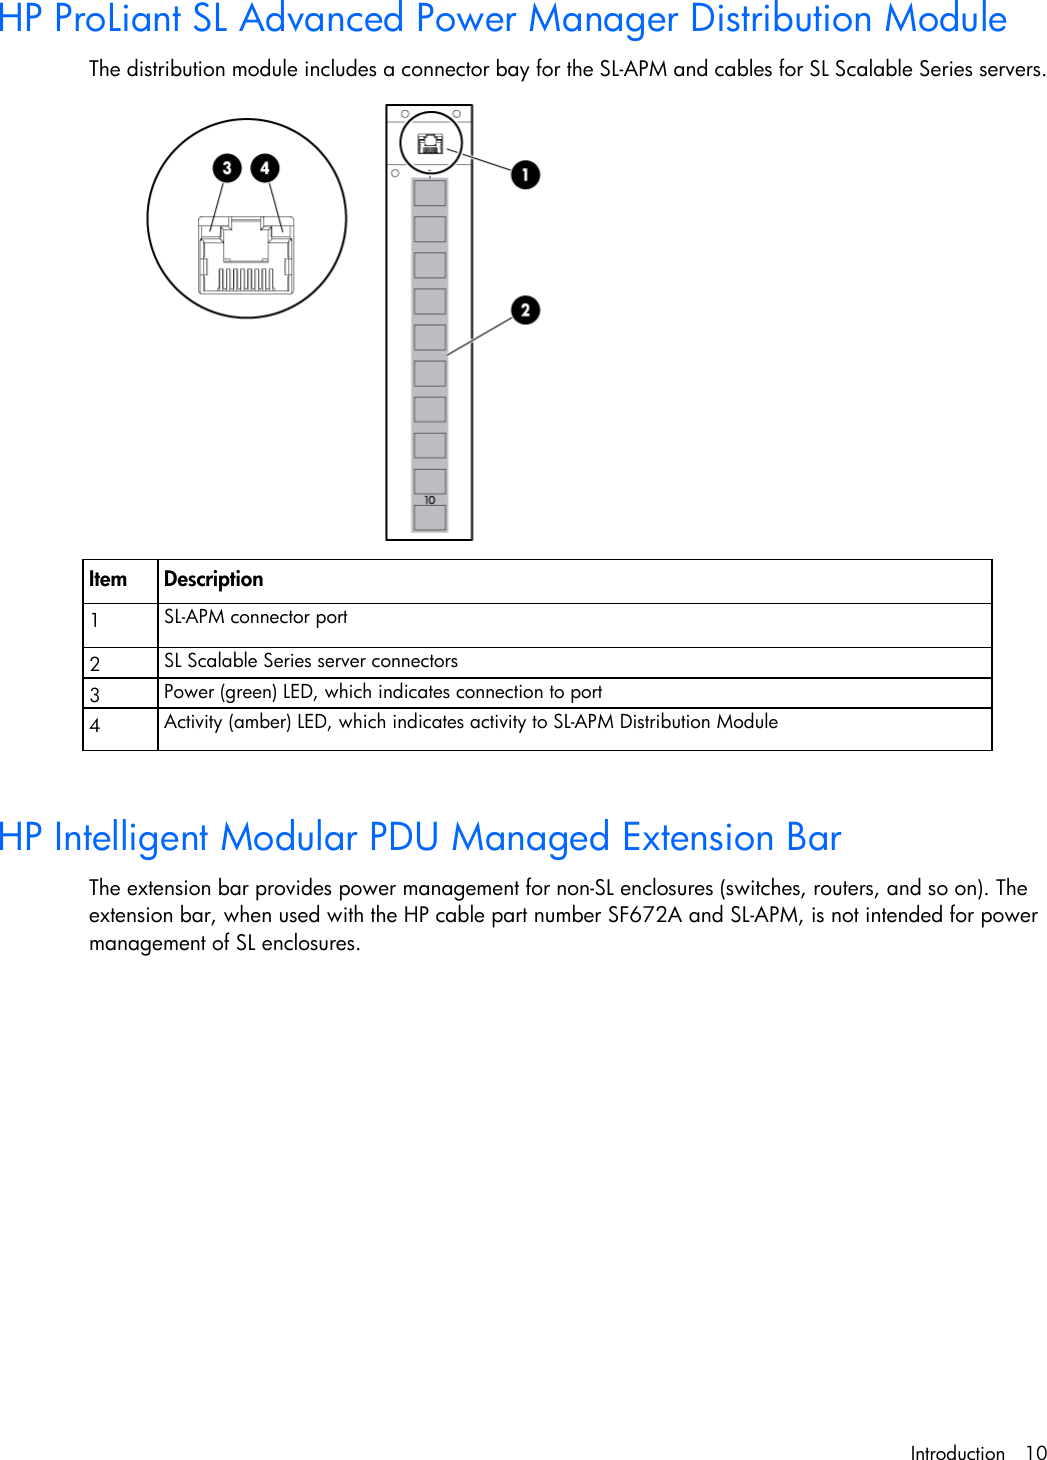 Hp Proliant Dl170E G6 Server Users Manual SL Advanced Power